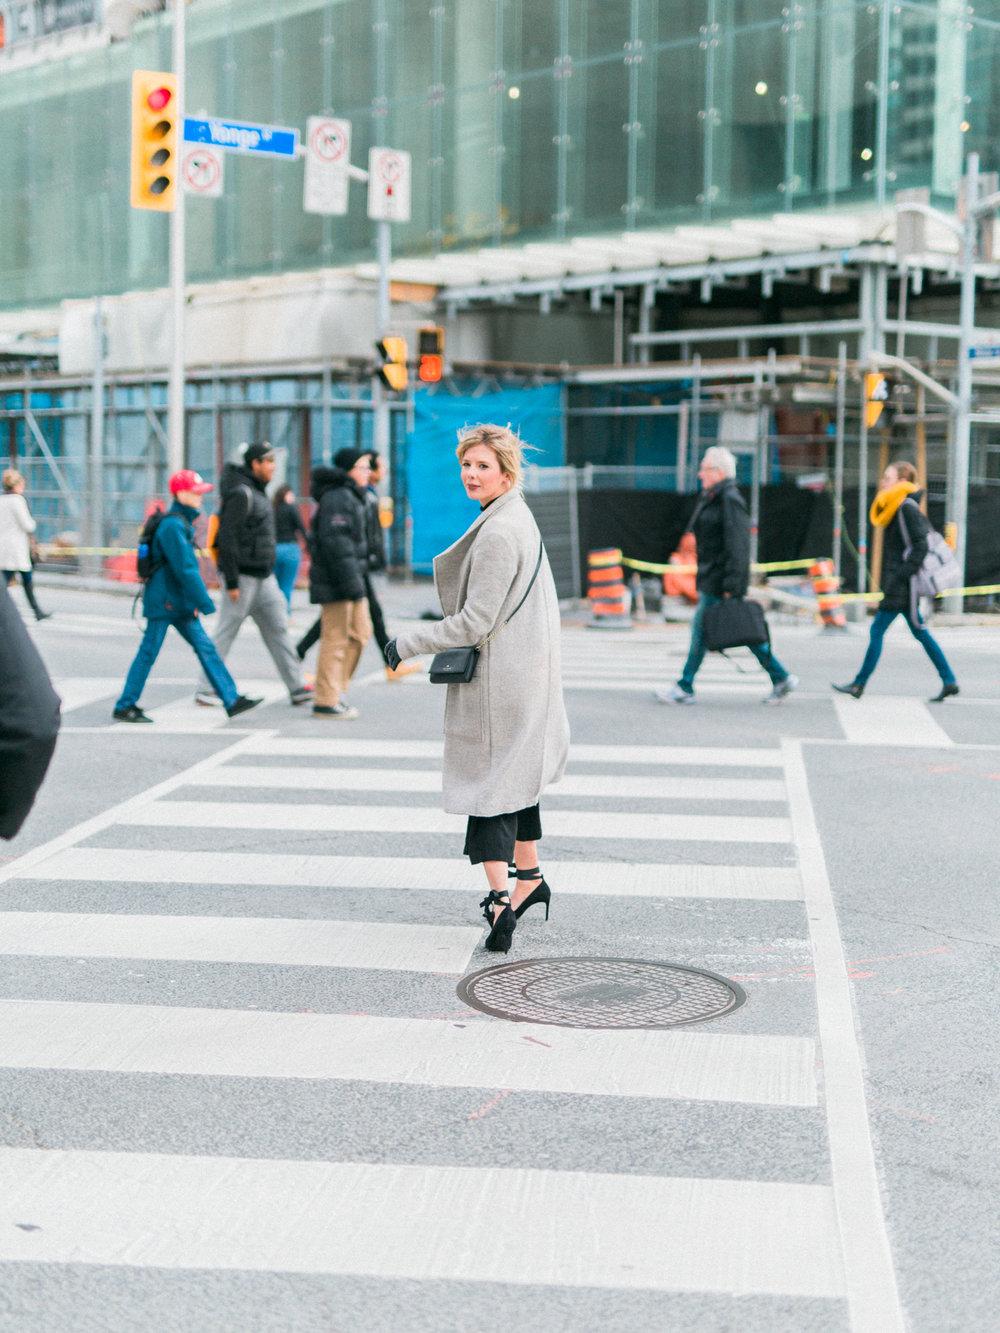 DanielleGirouxPhotography_Toronto_Portrait_StreetPhotography_0C6A1121.jpg